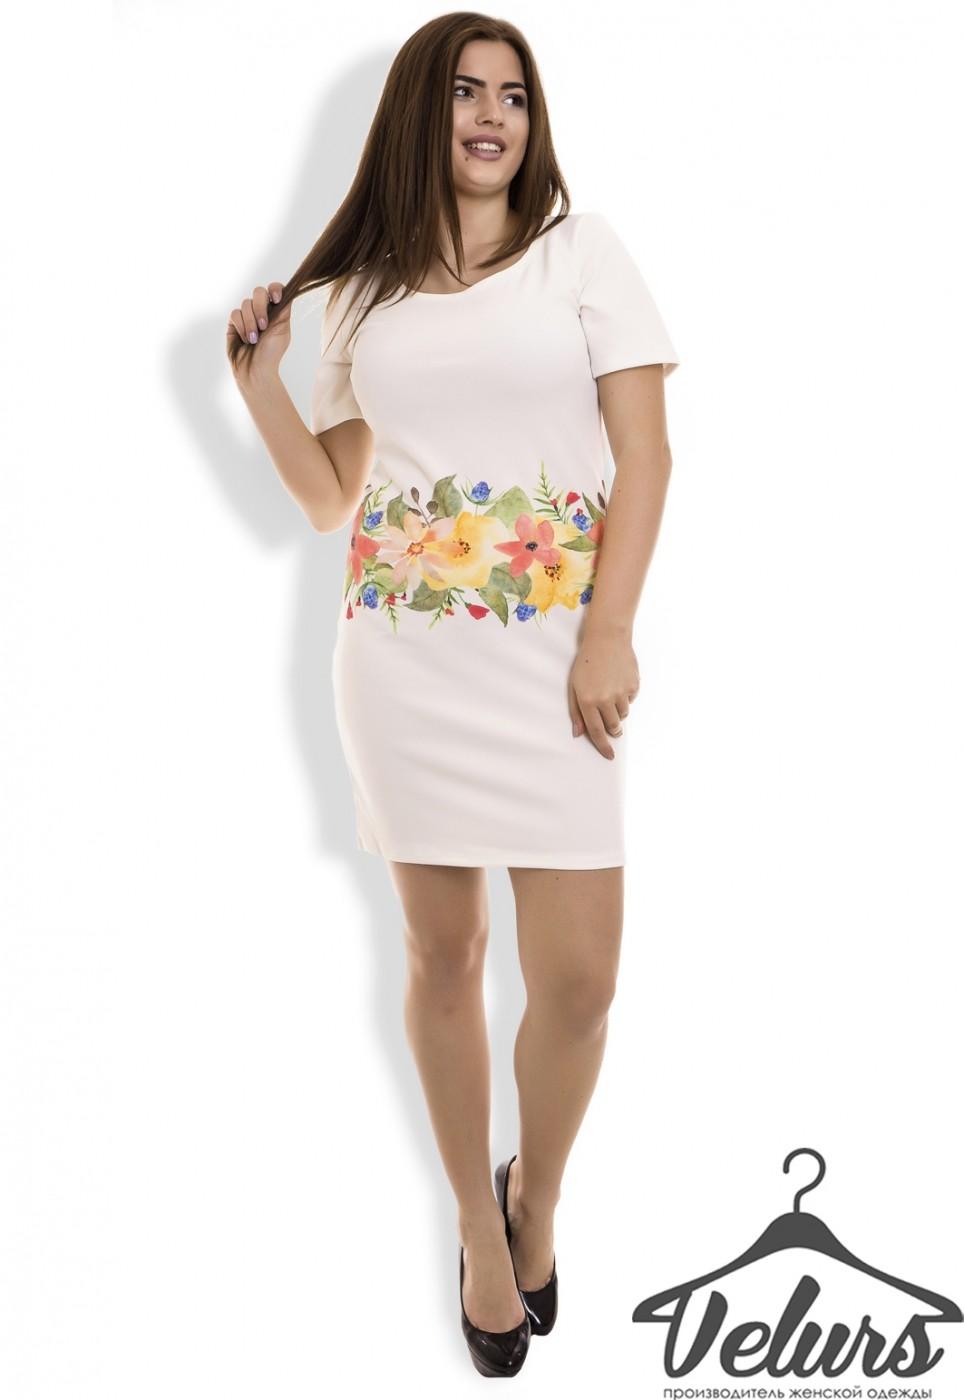 Velurs: Платье 212126 - фото 25